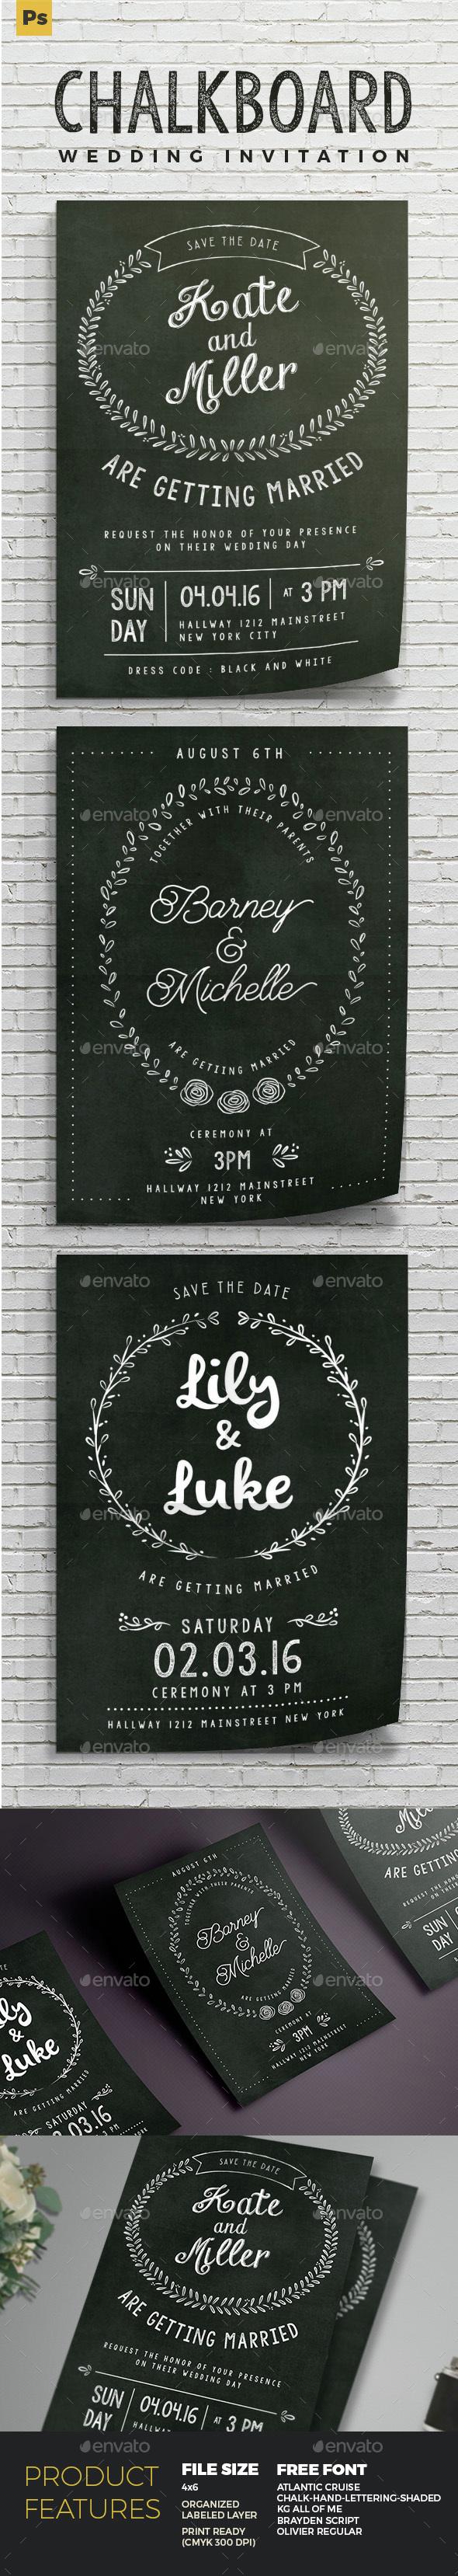 Chalkboard Wedding Invitation - Cards & Invites Print Templates